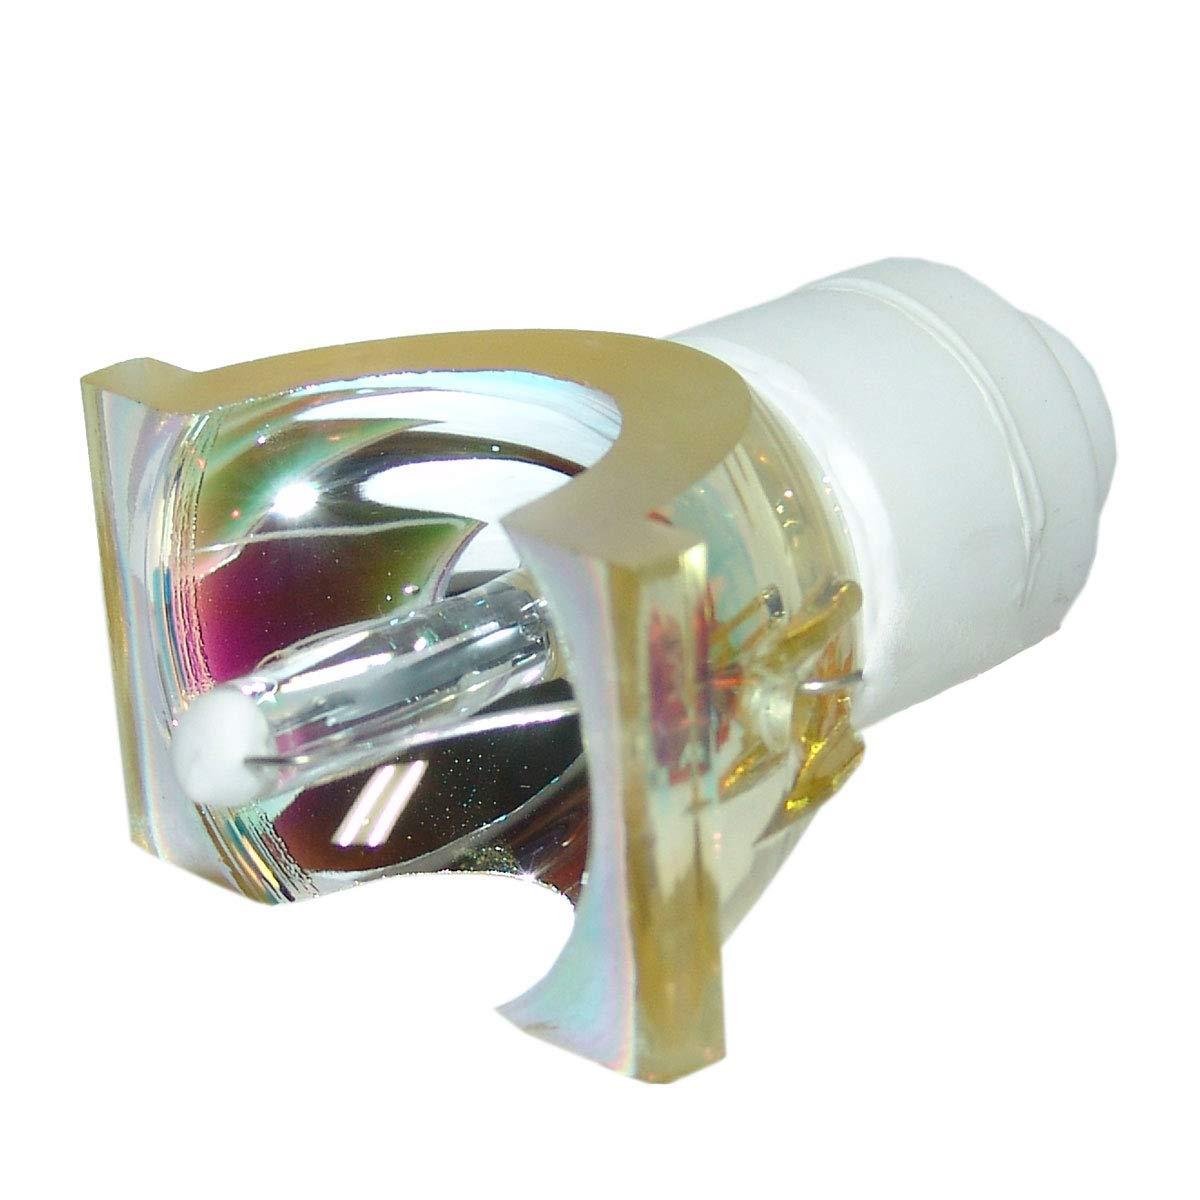 SpArc 交換用プロジェクターランプ 囲い/電球付き カシオXJ-S35用 Platinum (Brighter/Durable) B07MPSLZSS Economy|Lamp Only Lamp Only Economy